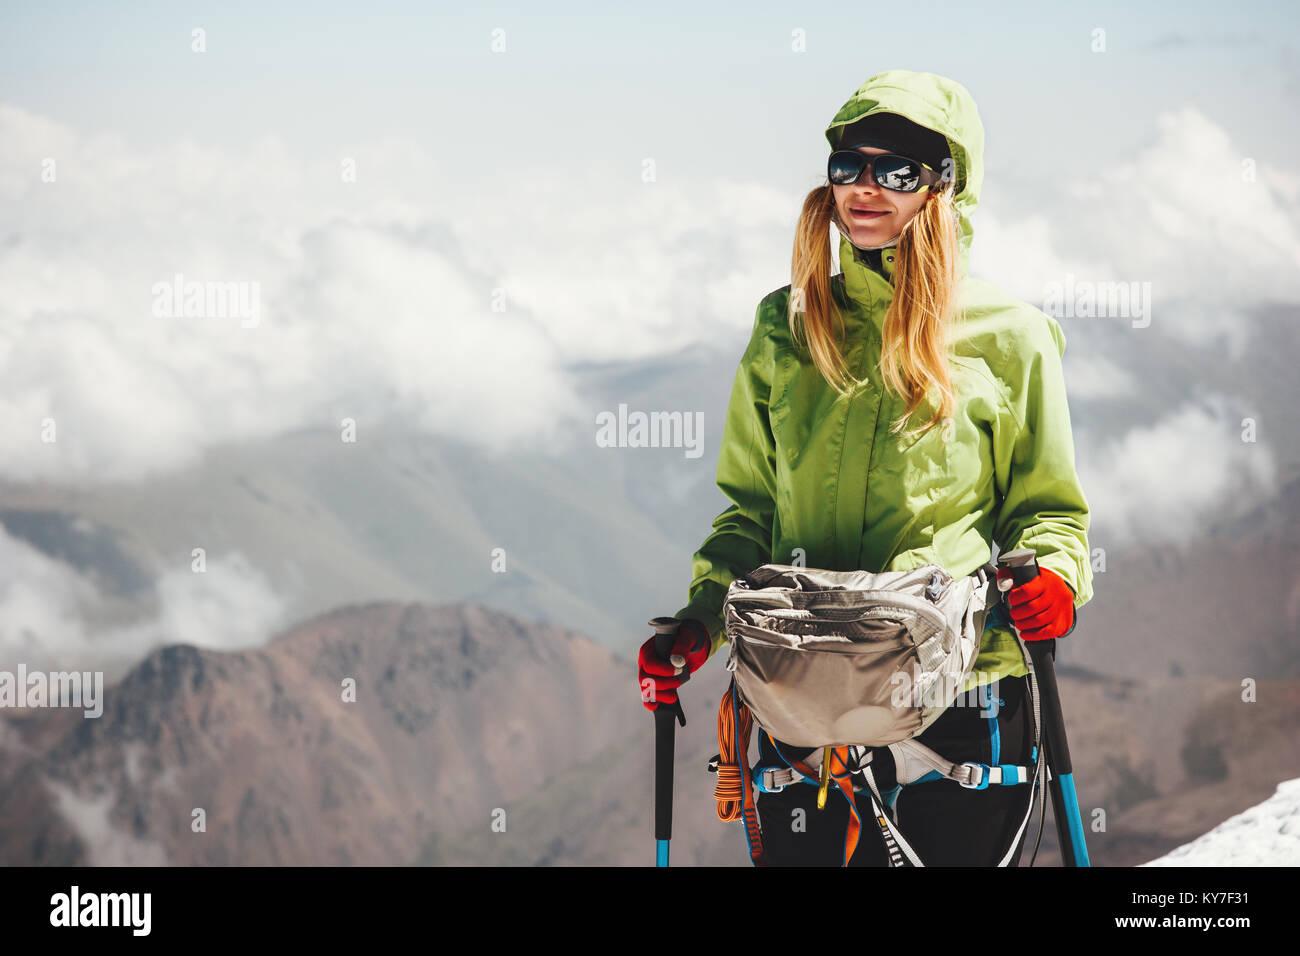 Frau Klettern am Berg Gipfel Reisen Lifestyle adventure Concept Active vacations outdoor Bergsteigen sport Erfolg Stockbild